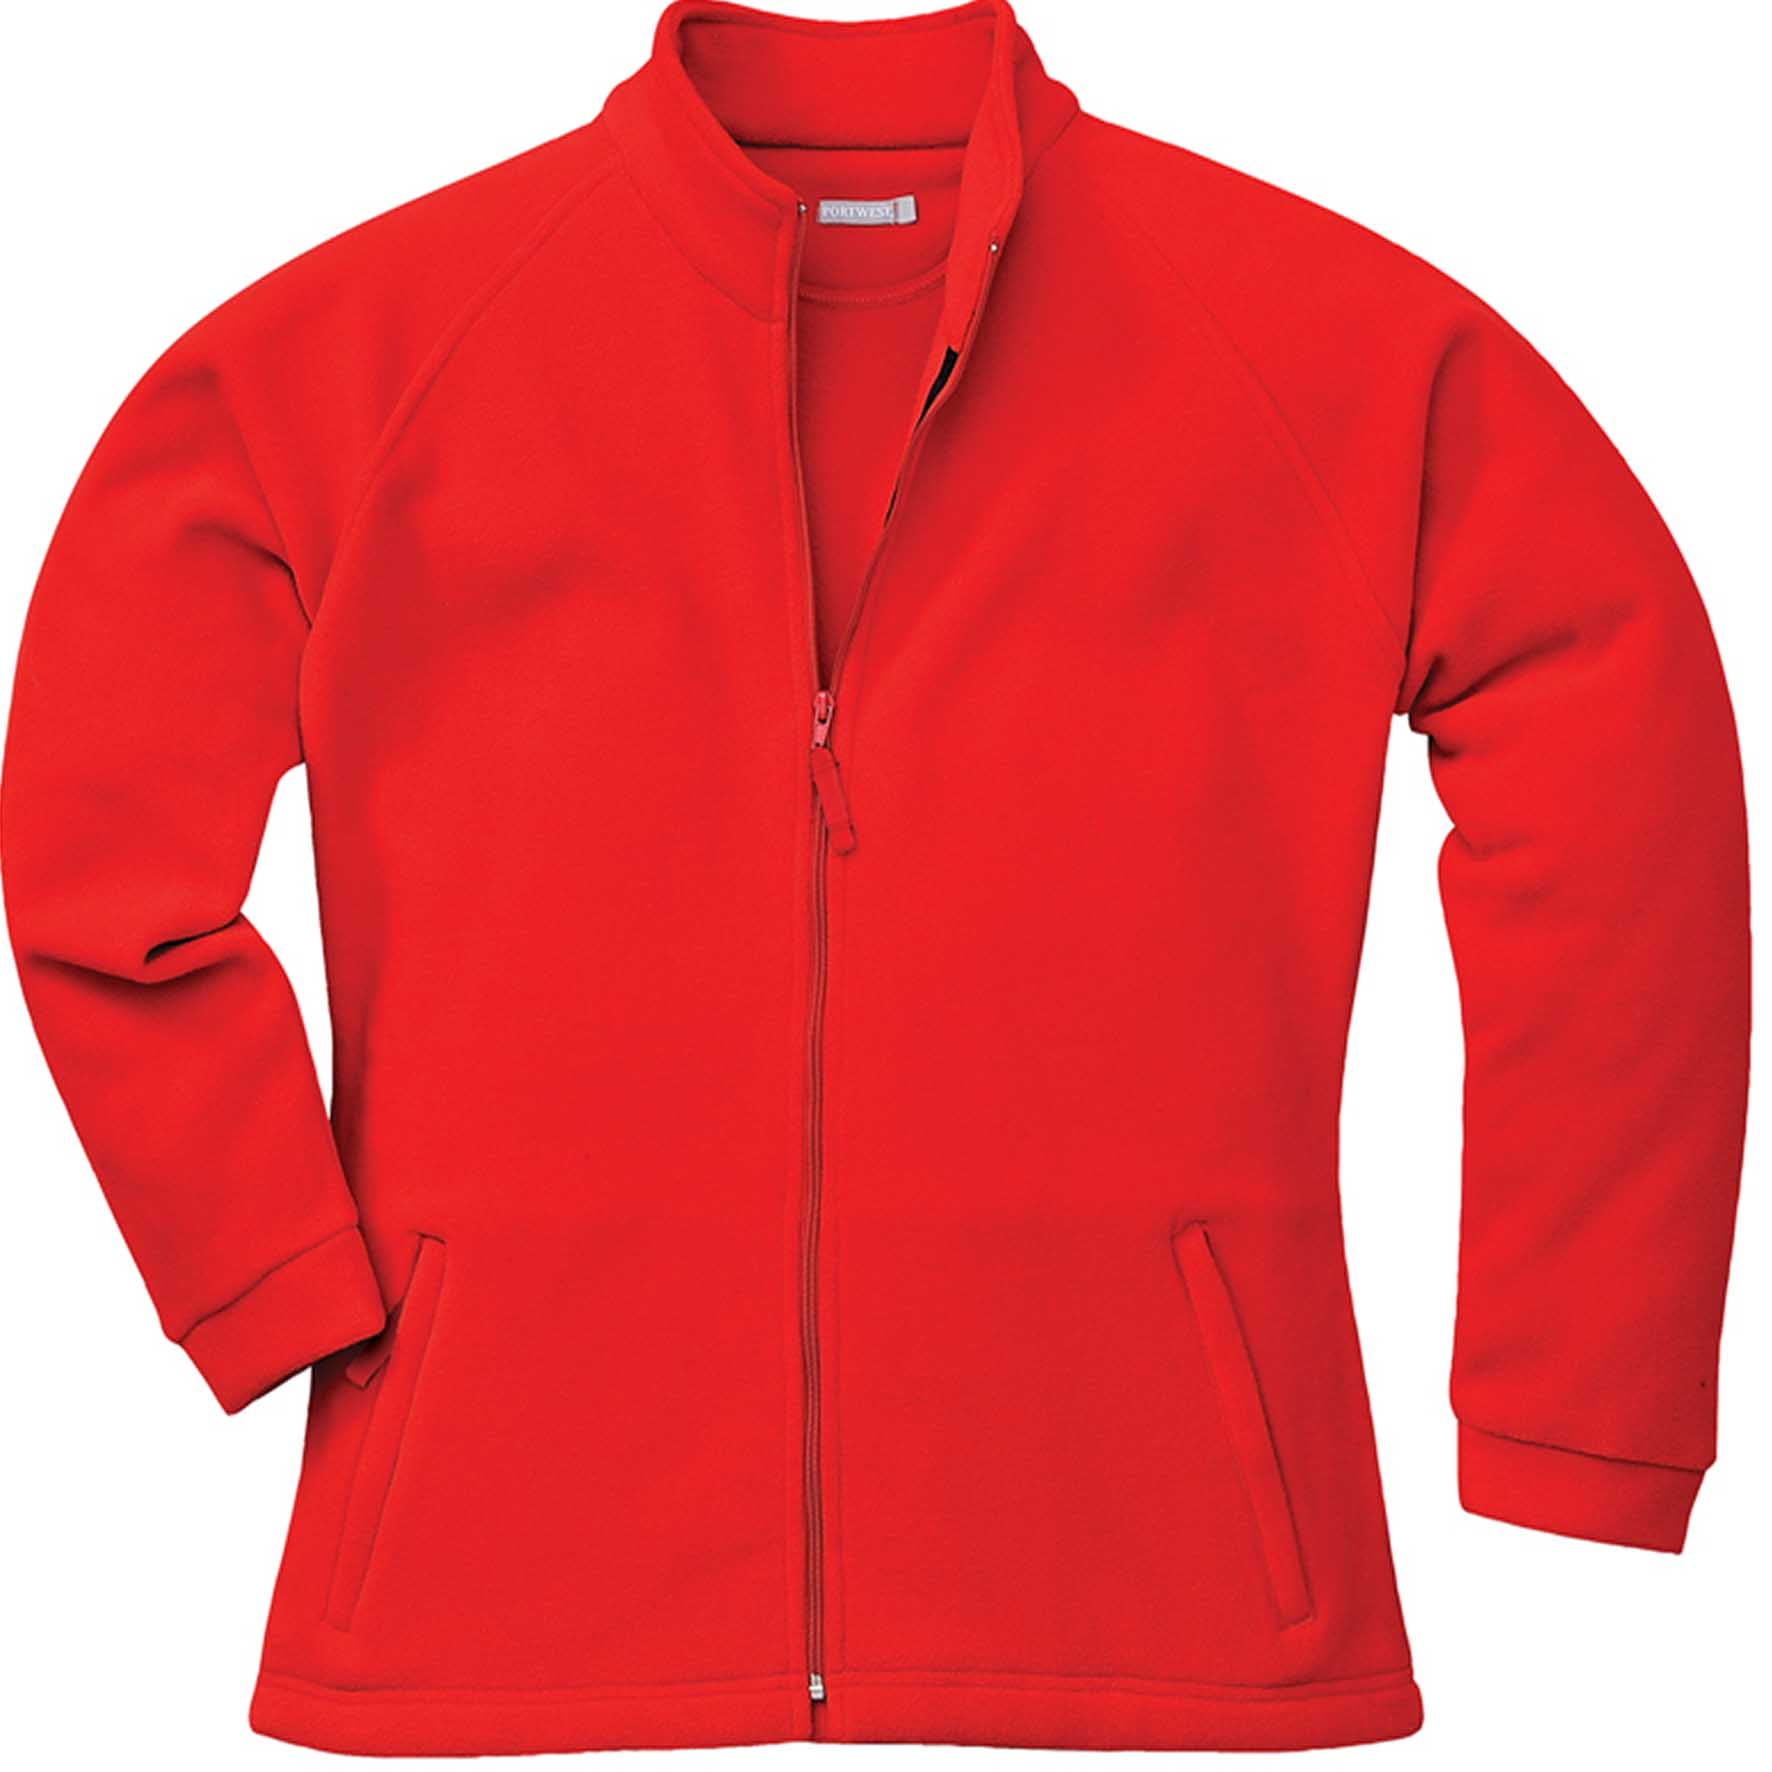 Damen Microfleece Jacke, schwarz